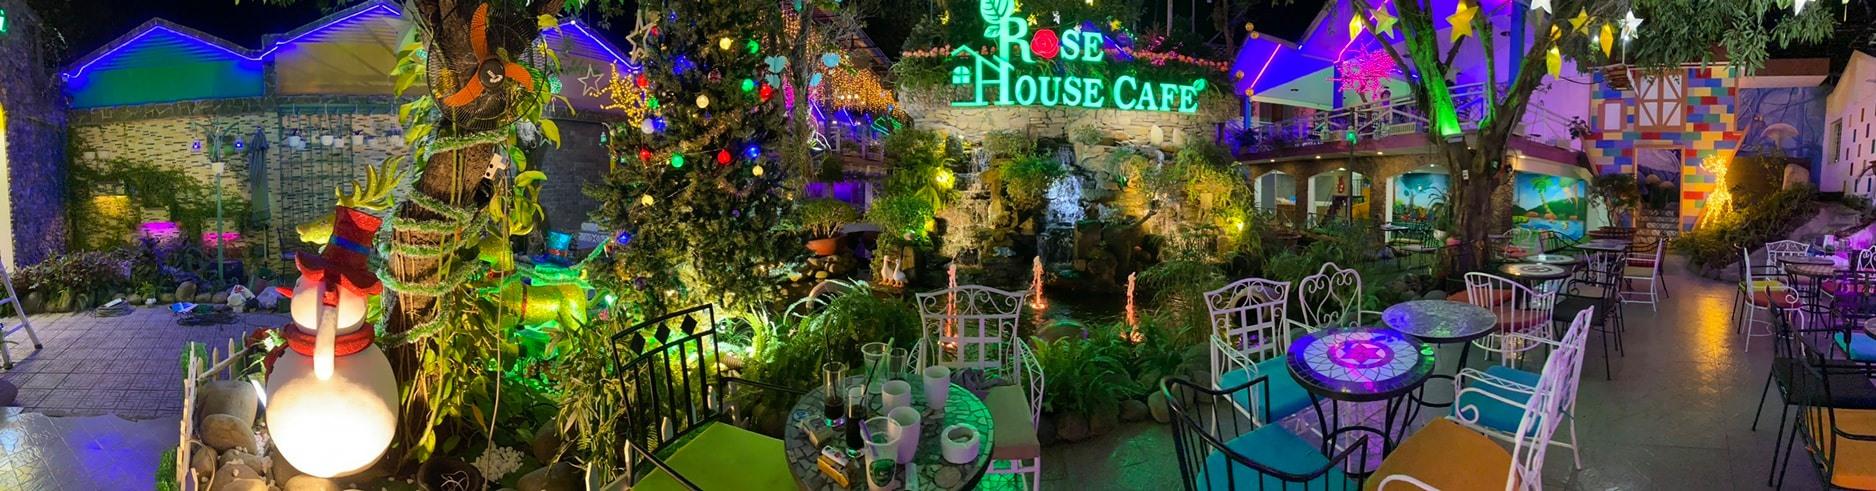 Cafe Rose House